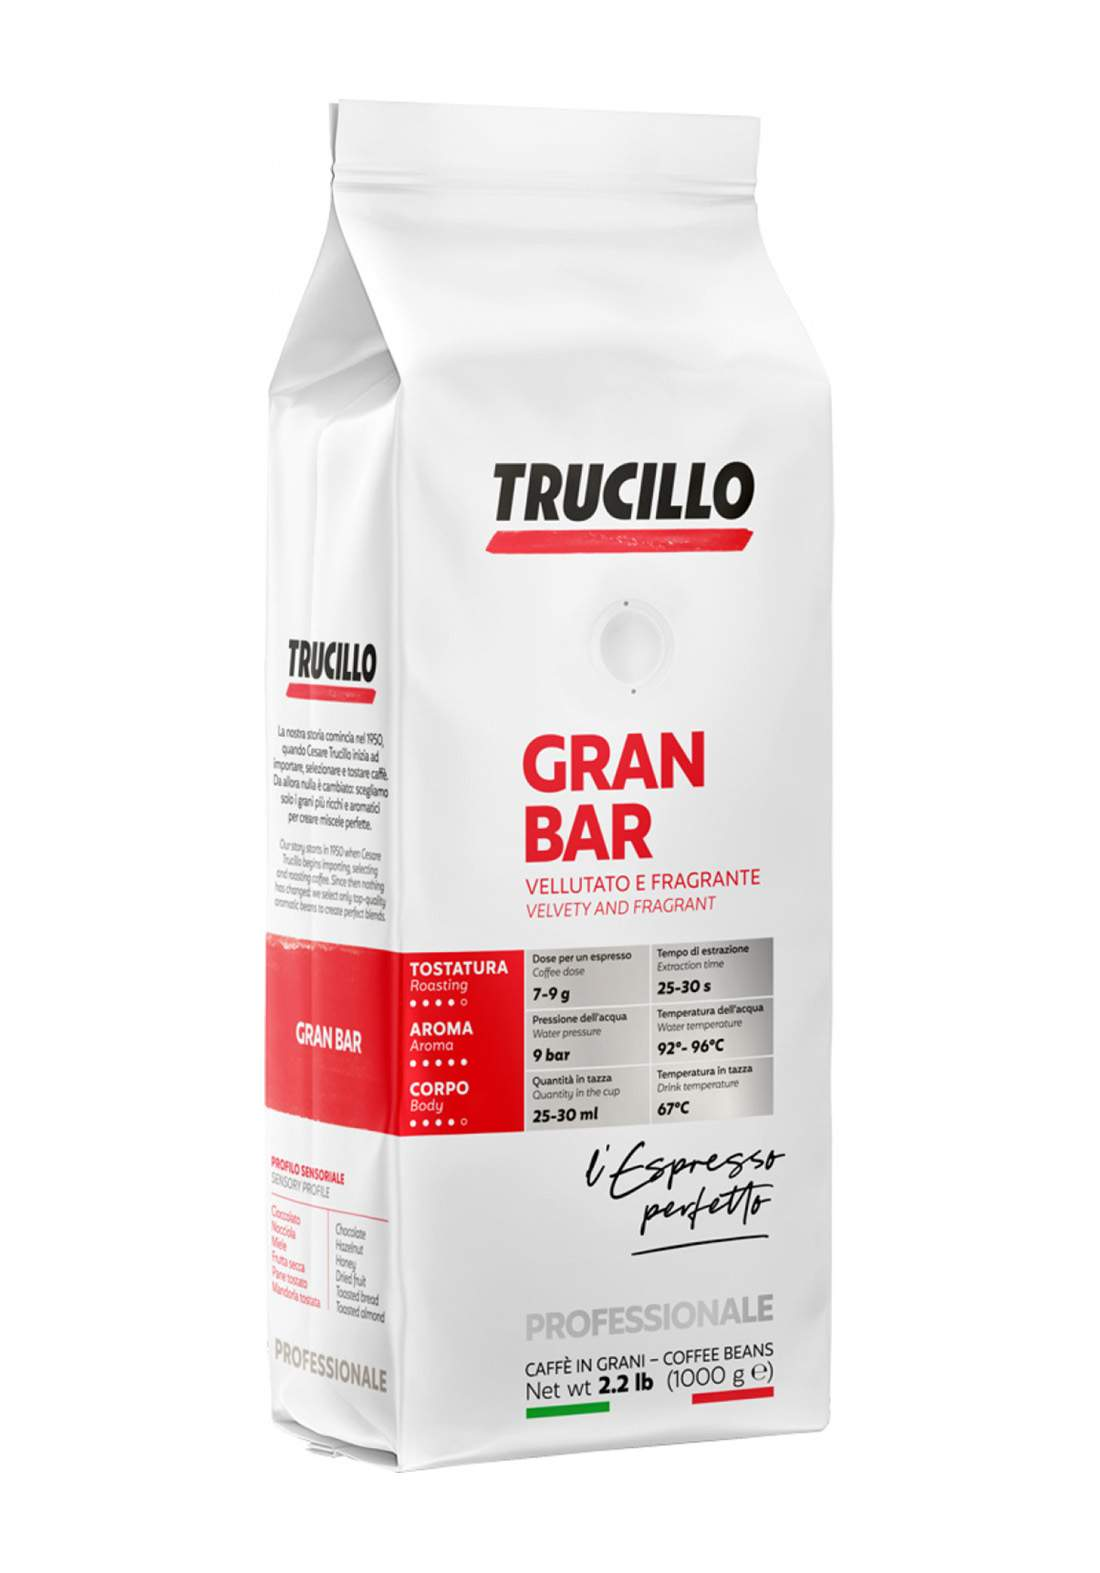 Trucillo Premium Gran Bar 1Kg قهوة